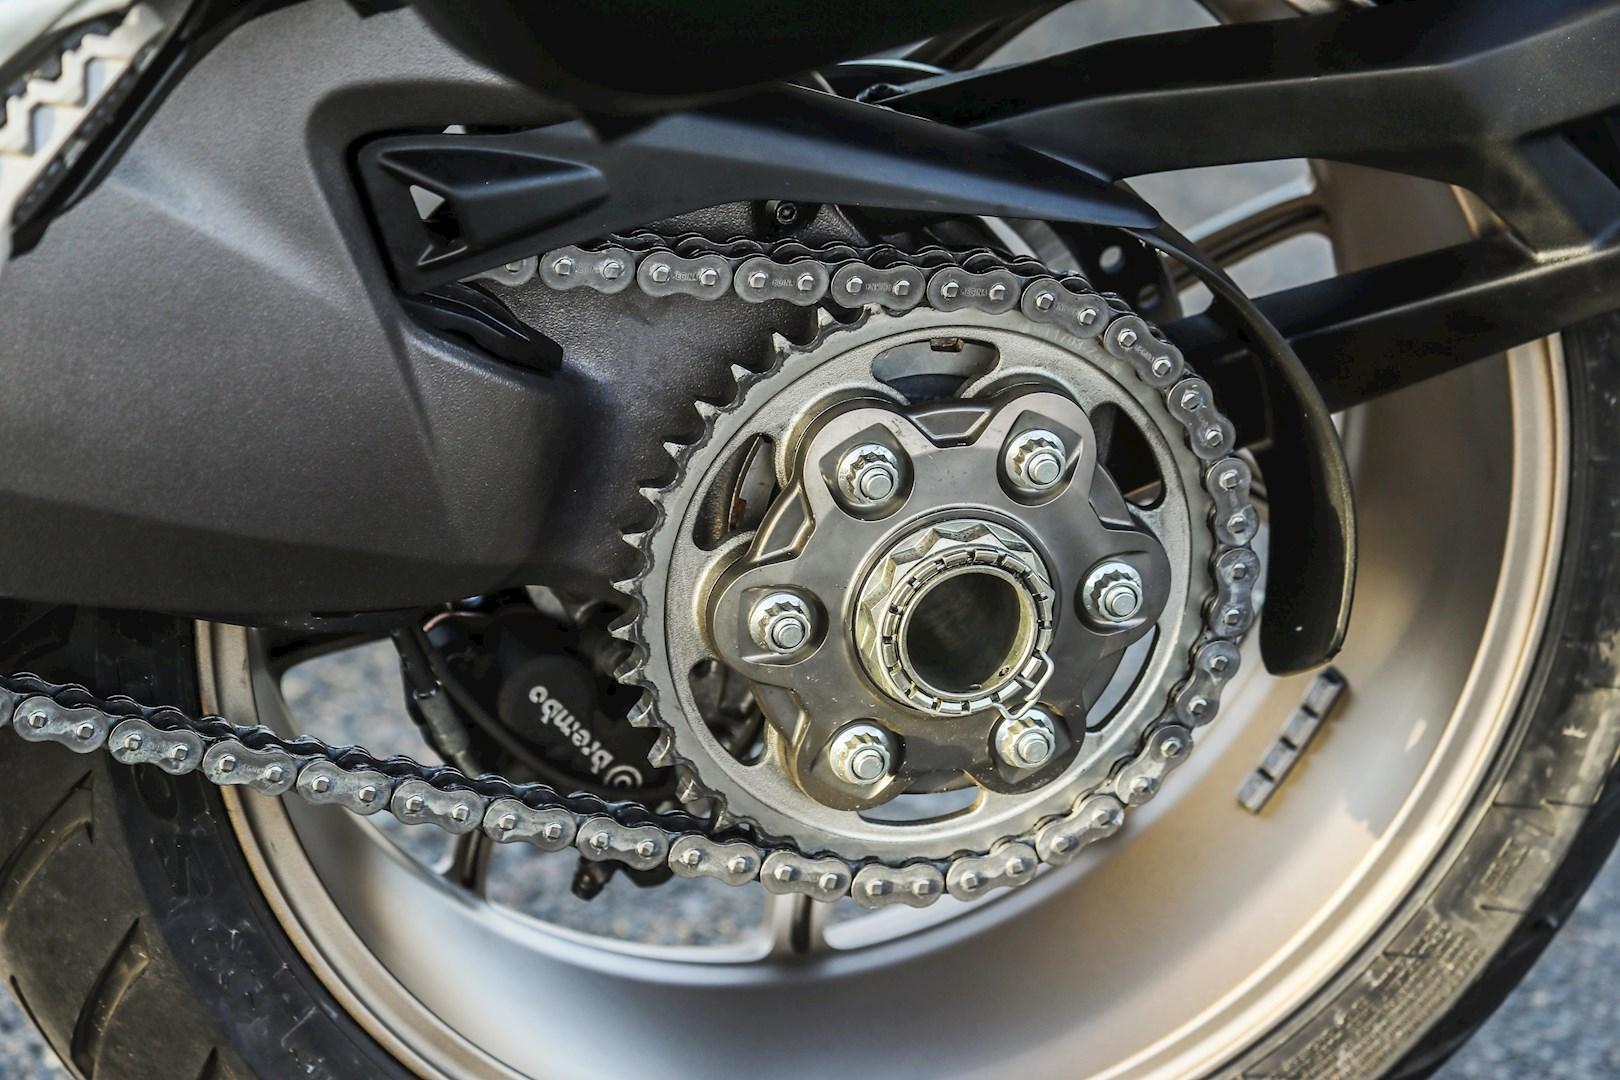 МОТОЦИКЛ DUCATI MULTISTRADA 1260 S ― Артмото - купить квадроцикл в украине и харькове, мотоцикл, снегоход, скутер, мопед, электромобиль